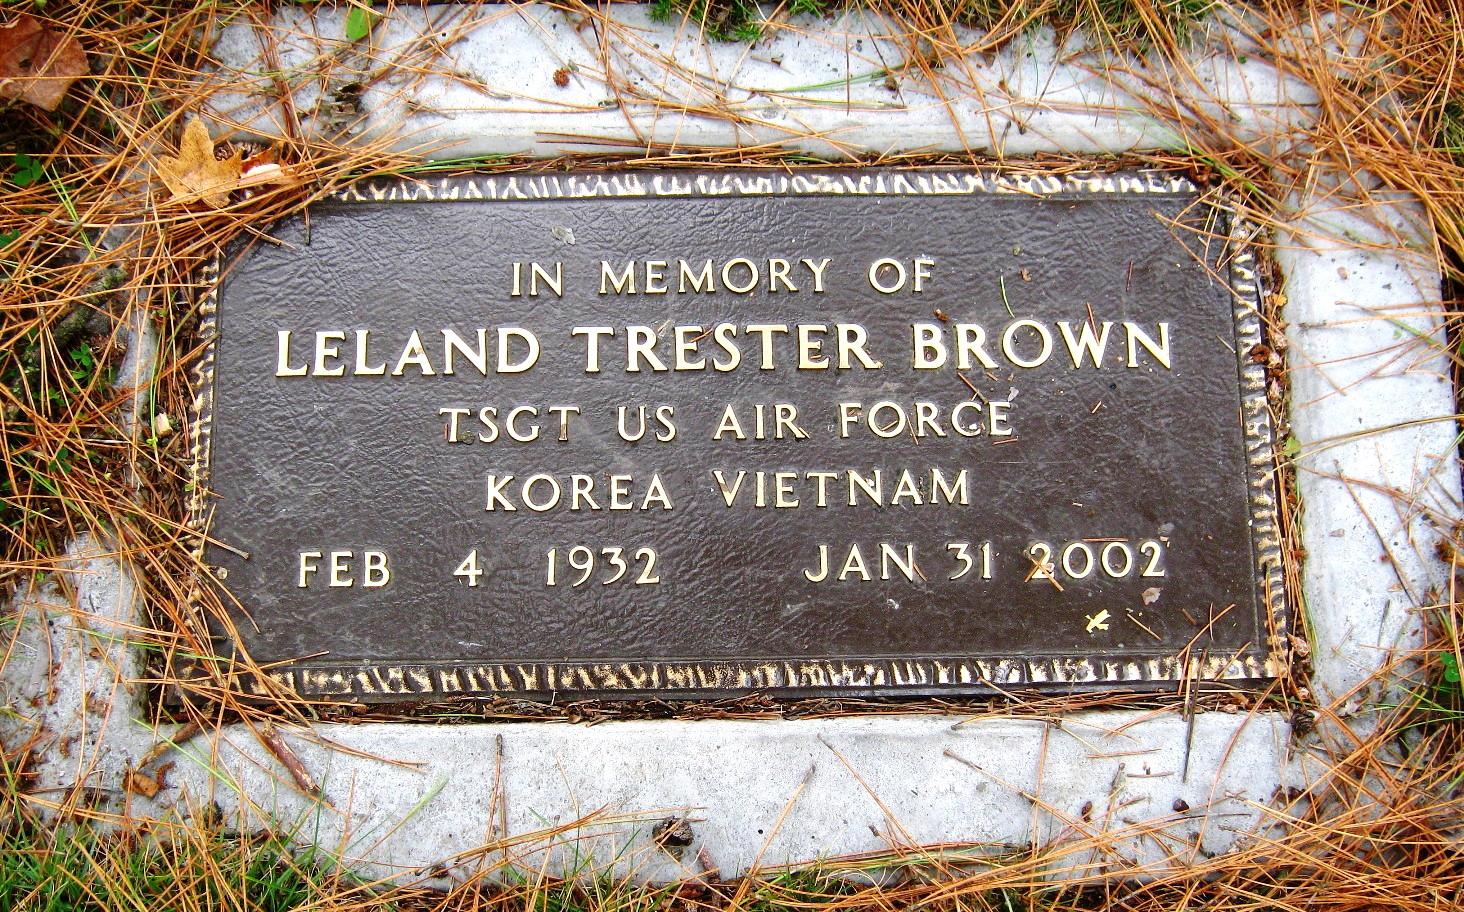 Leland Trester Brown